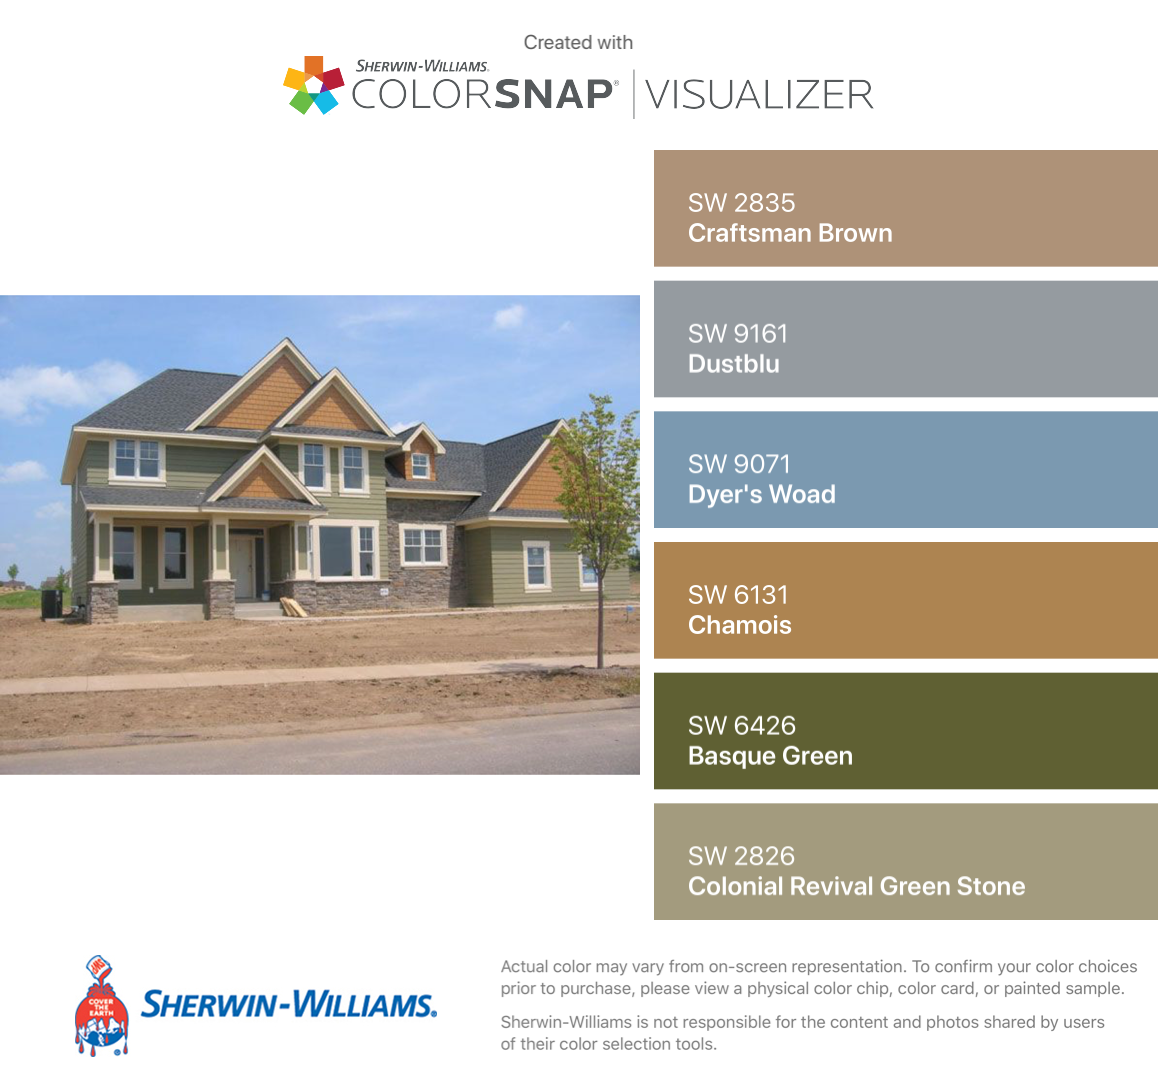 Sage And Brown Color Schemes: Image Result For Craftsman Brown Sw2835